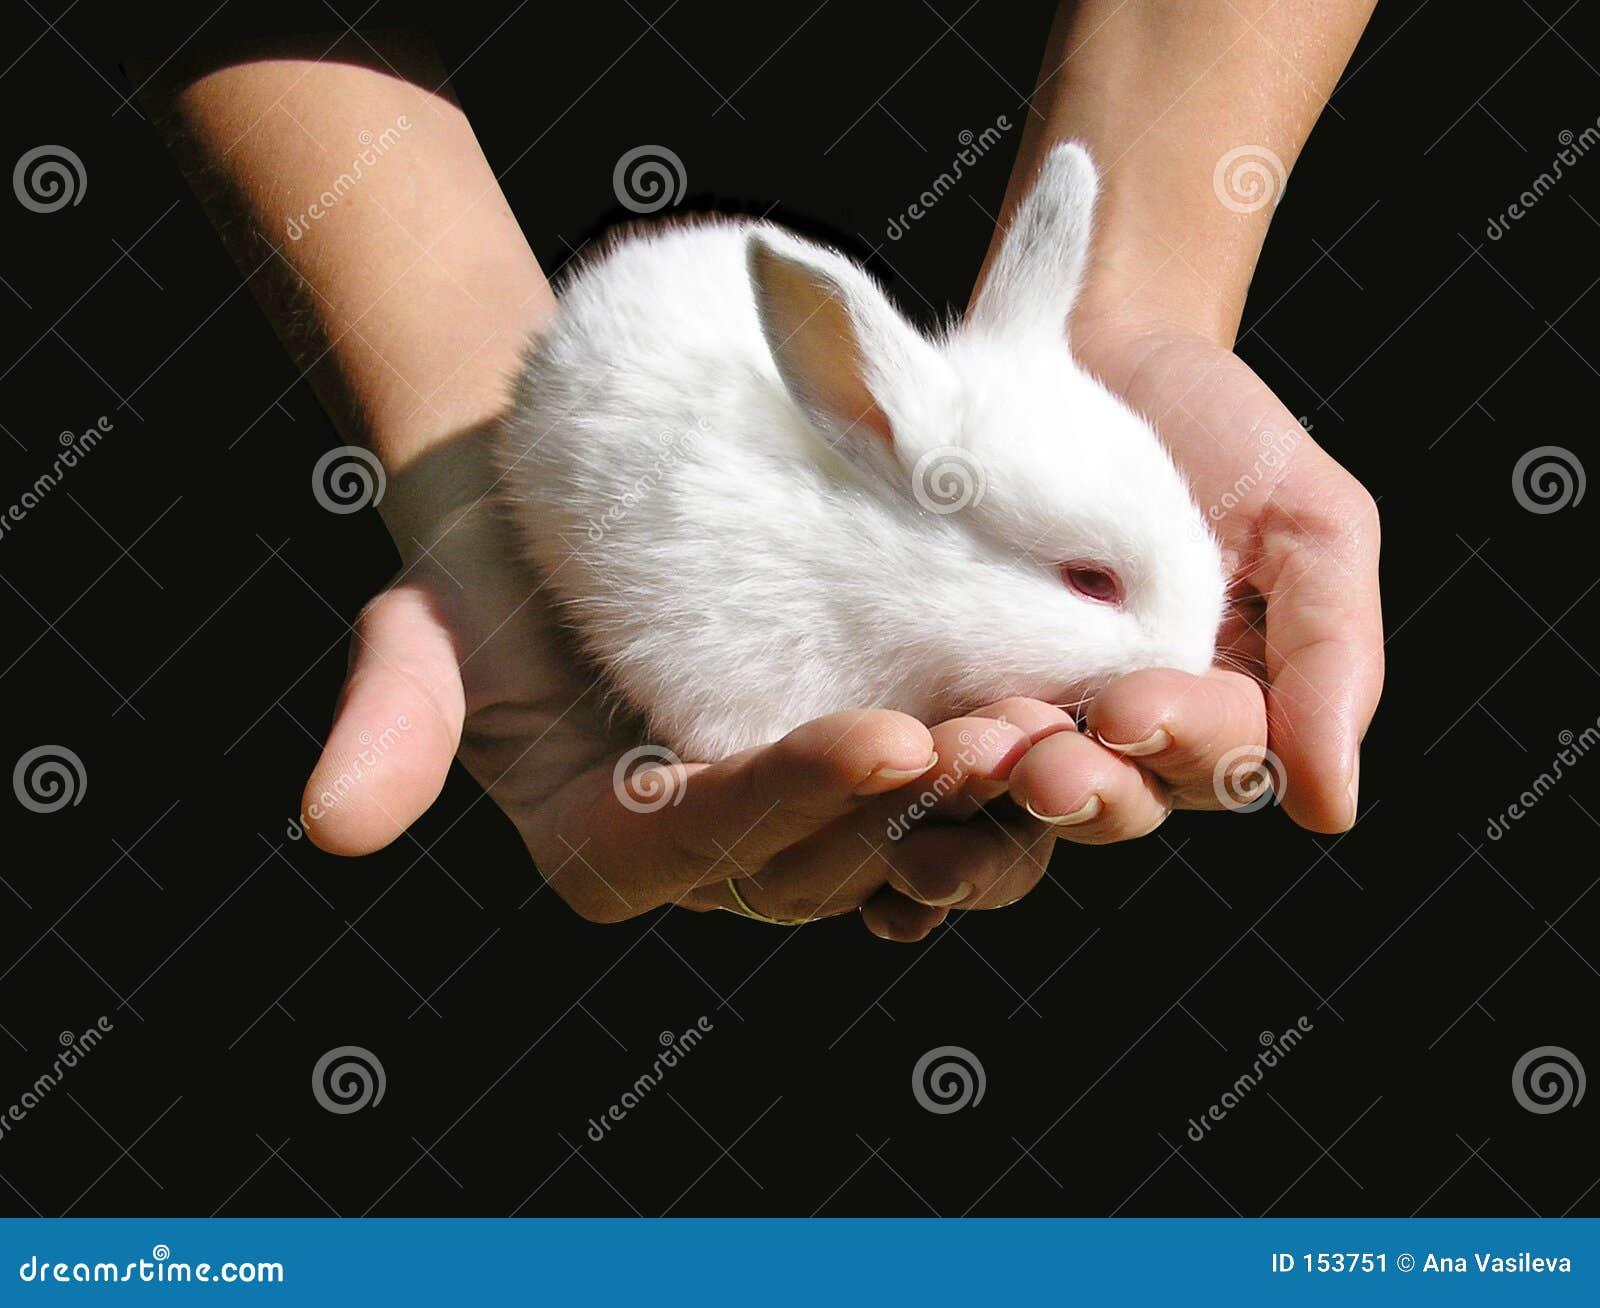 White baby-rabbit in woman s hands